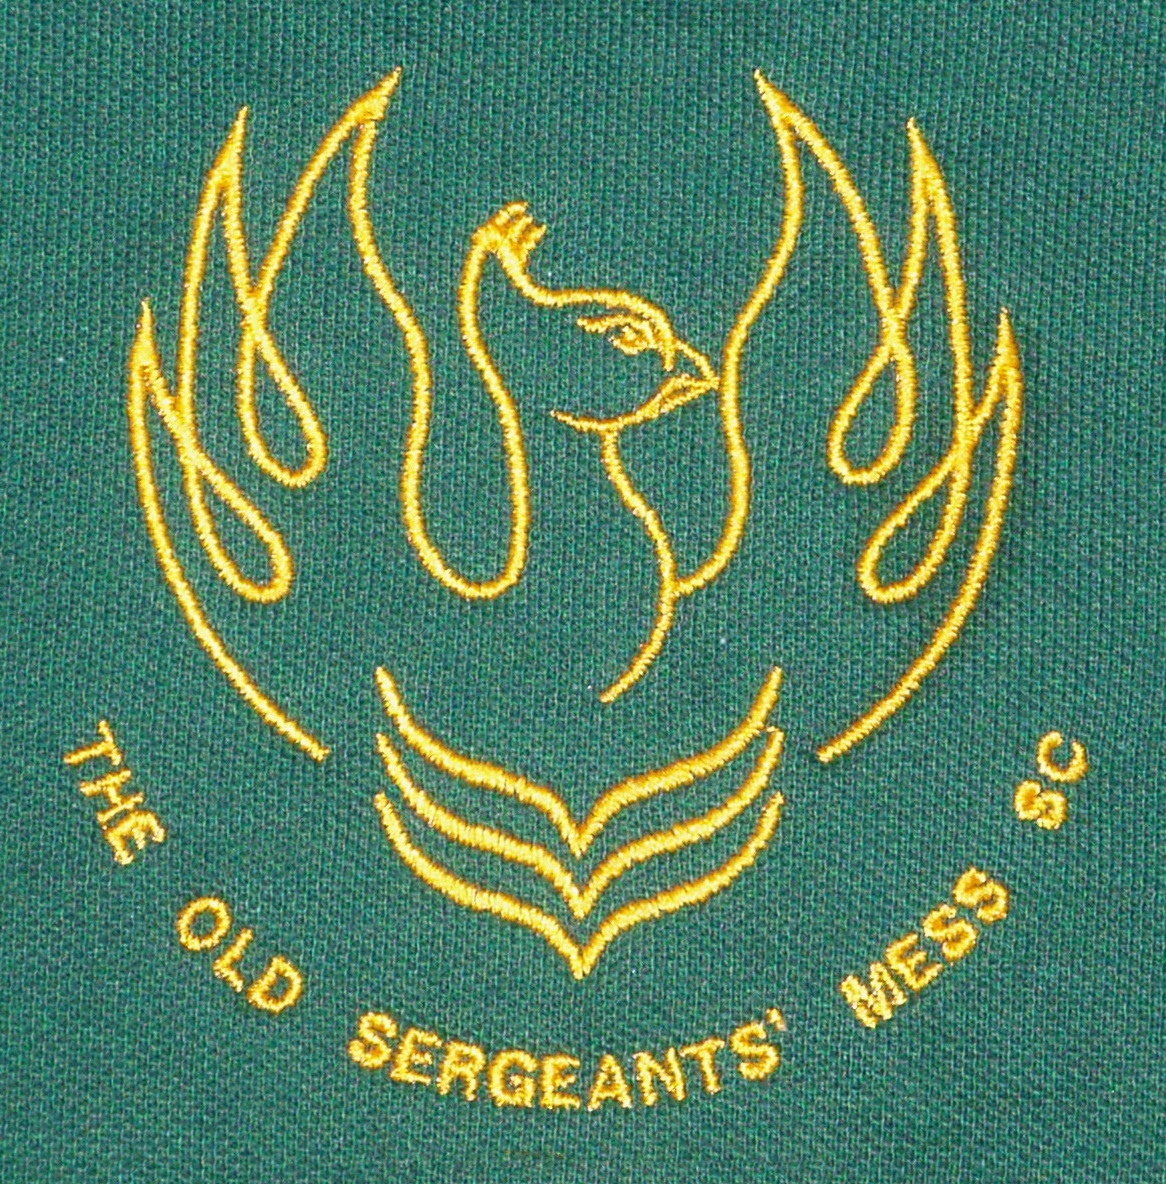 Old Sergeants Mess SC logo